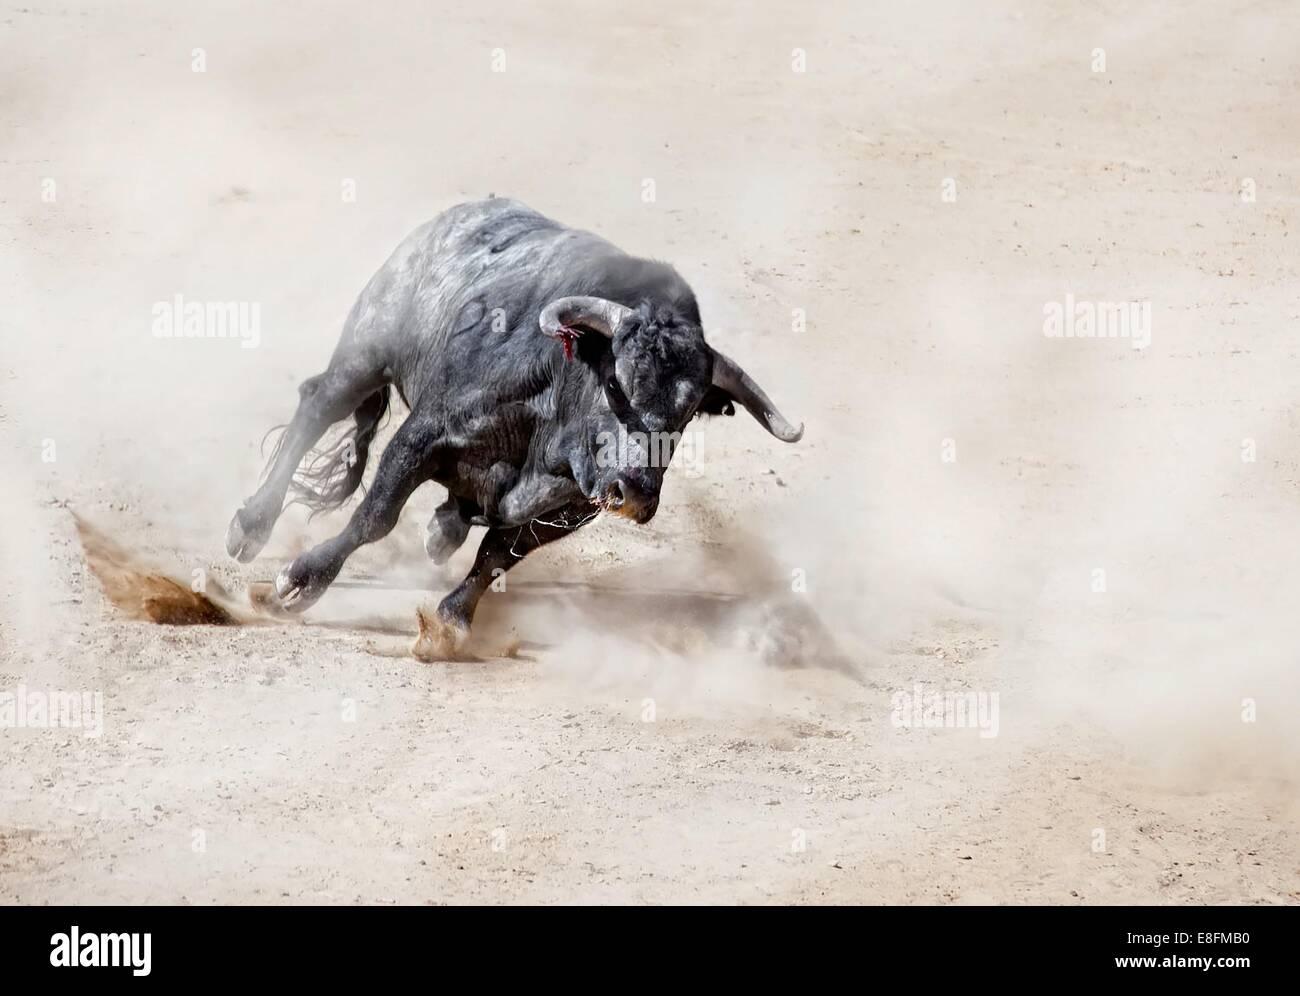 Bull charging across sand creating dust cloud - Stock Image